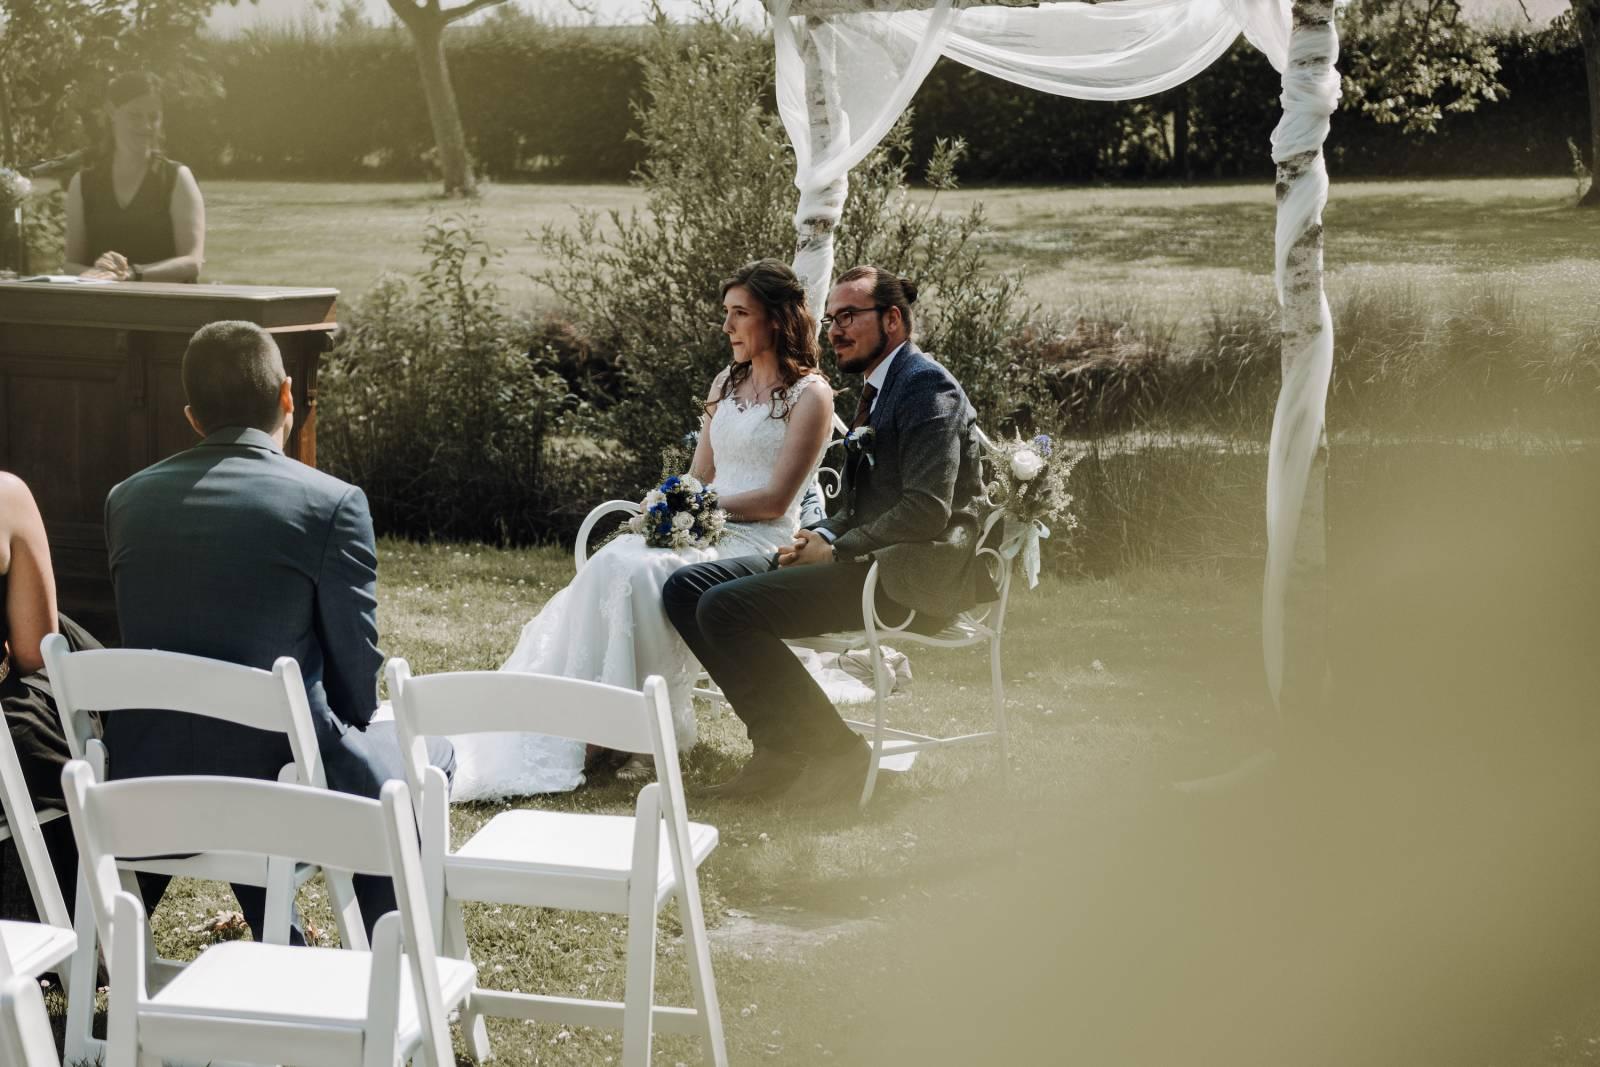 Atelier Rosé - Wedding Planner - House of Weddings © Djorden Vlaeminck Fotografie (1)